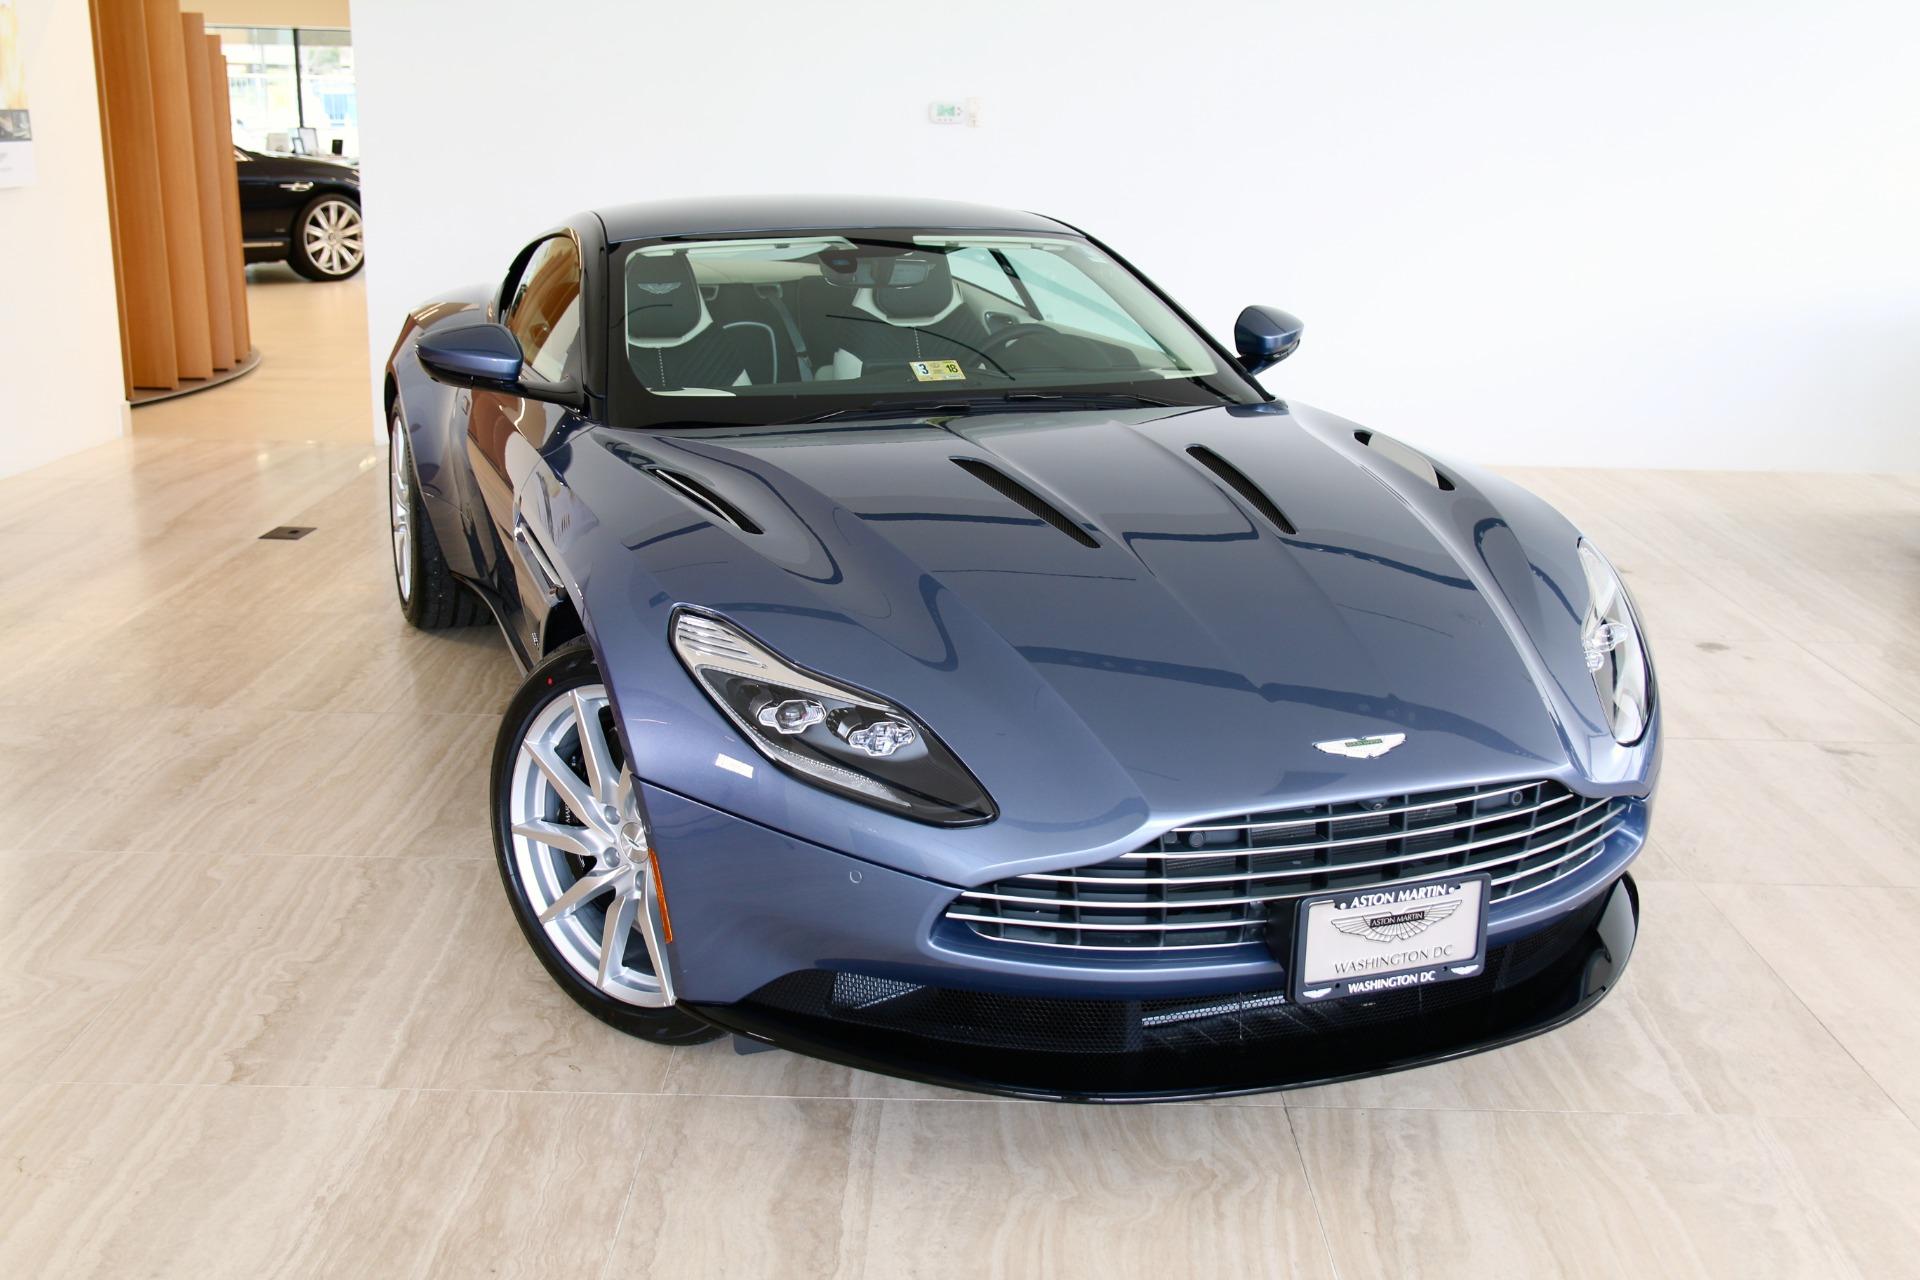 Aston Martin DB Stock N For Sale Near Vienna VA VA - Aston martin washington dc